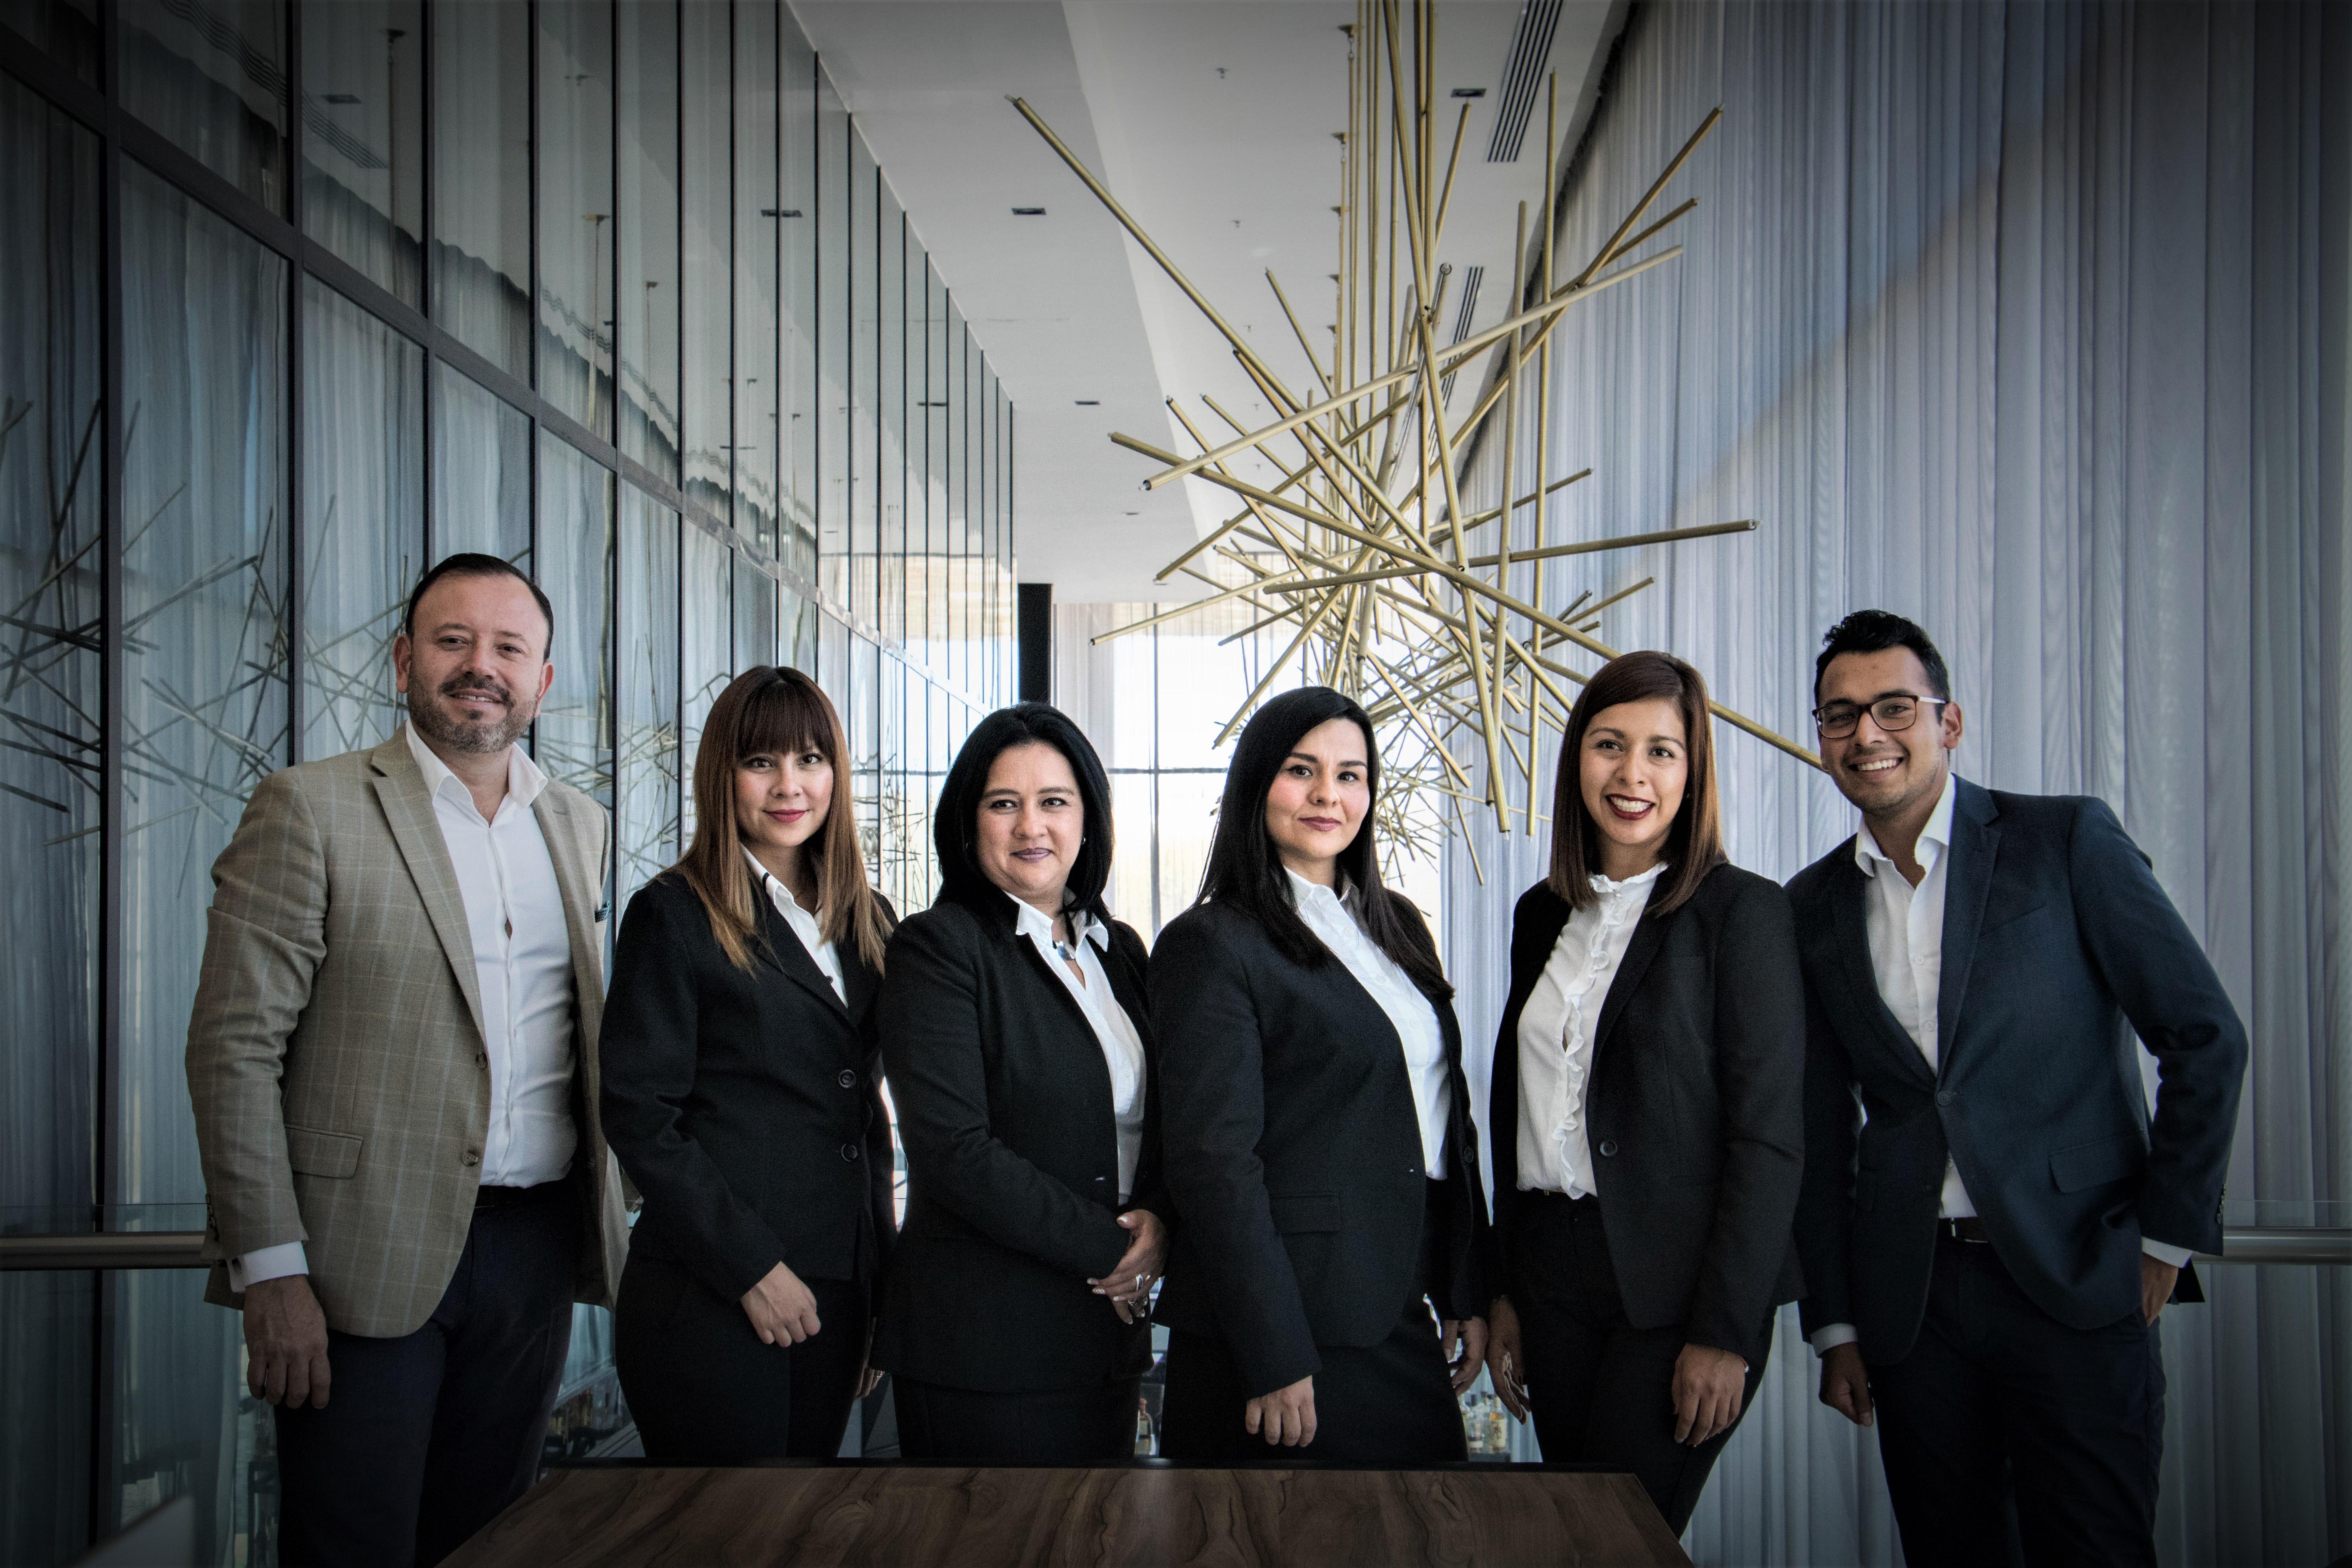 business-confidence-corporate-776615